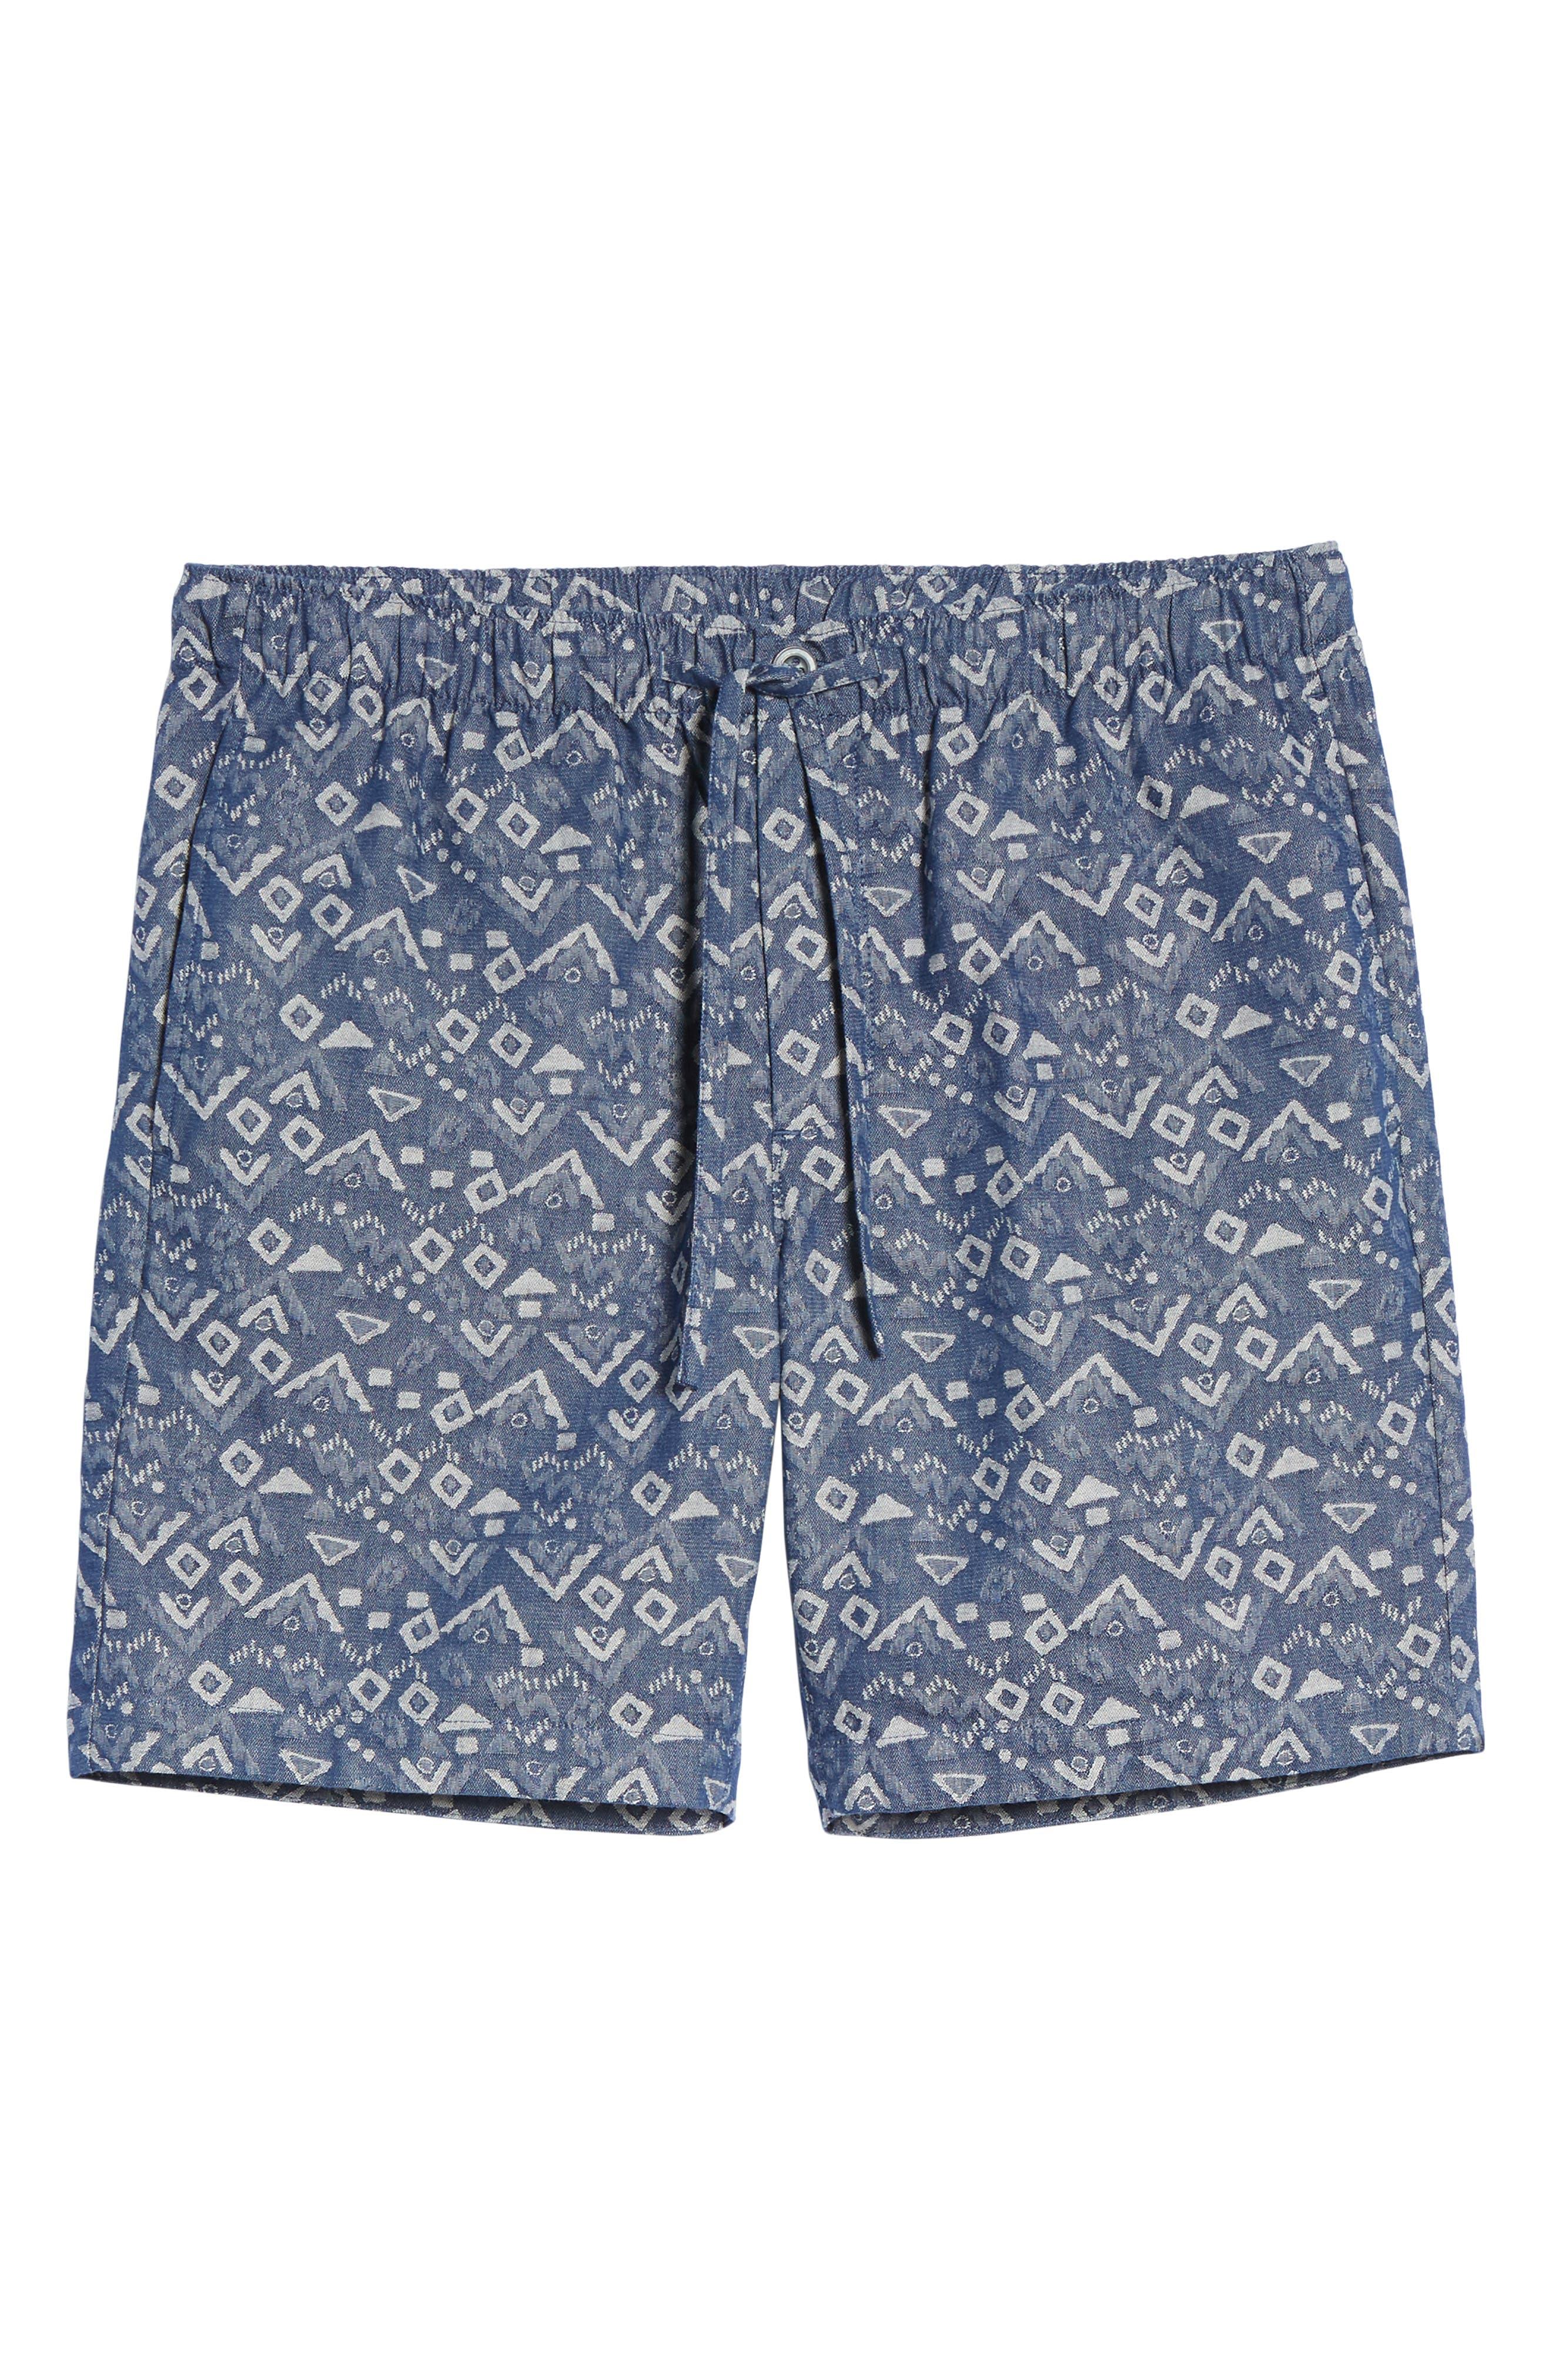 Slim Fit Print Beach Shorts,                             Alternate thumbnail 6, color,                             Triangles Jacquard